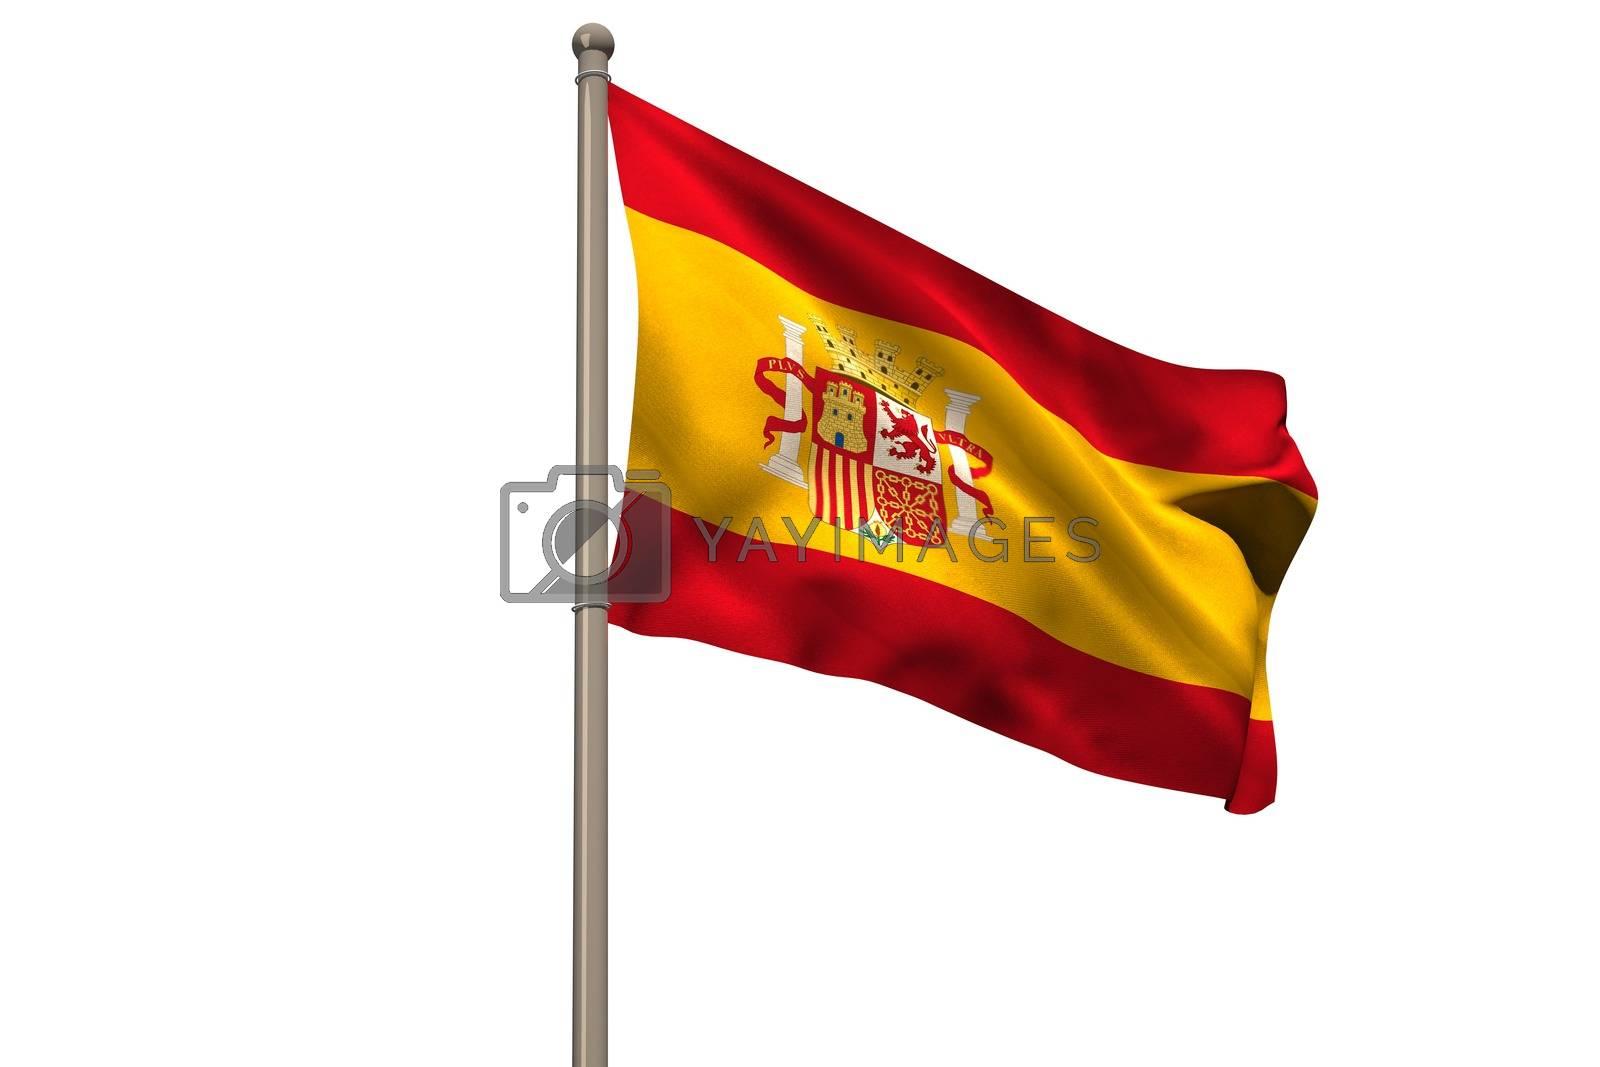 Royalty free image of Digitally generated spain national flag by Wavebreakmedia